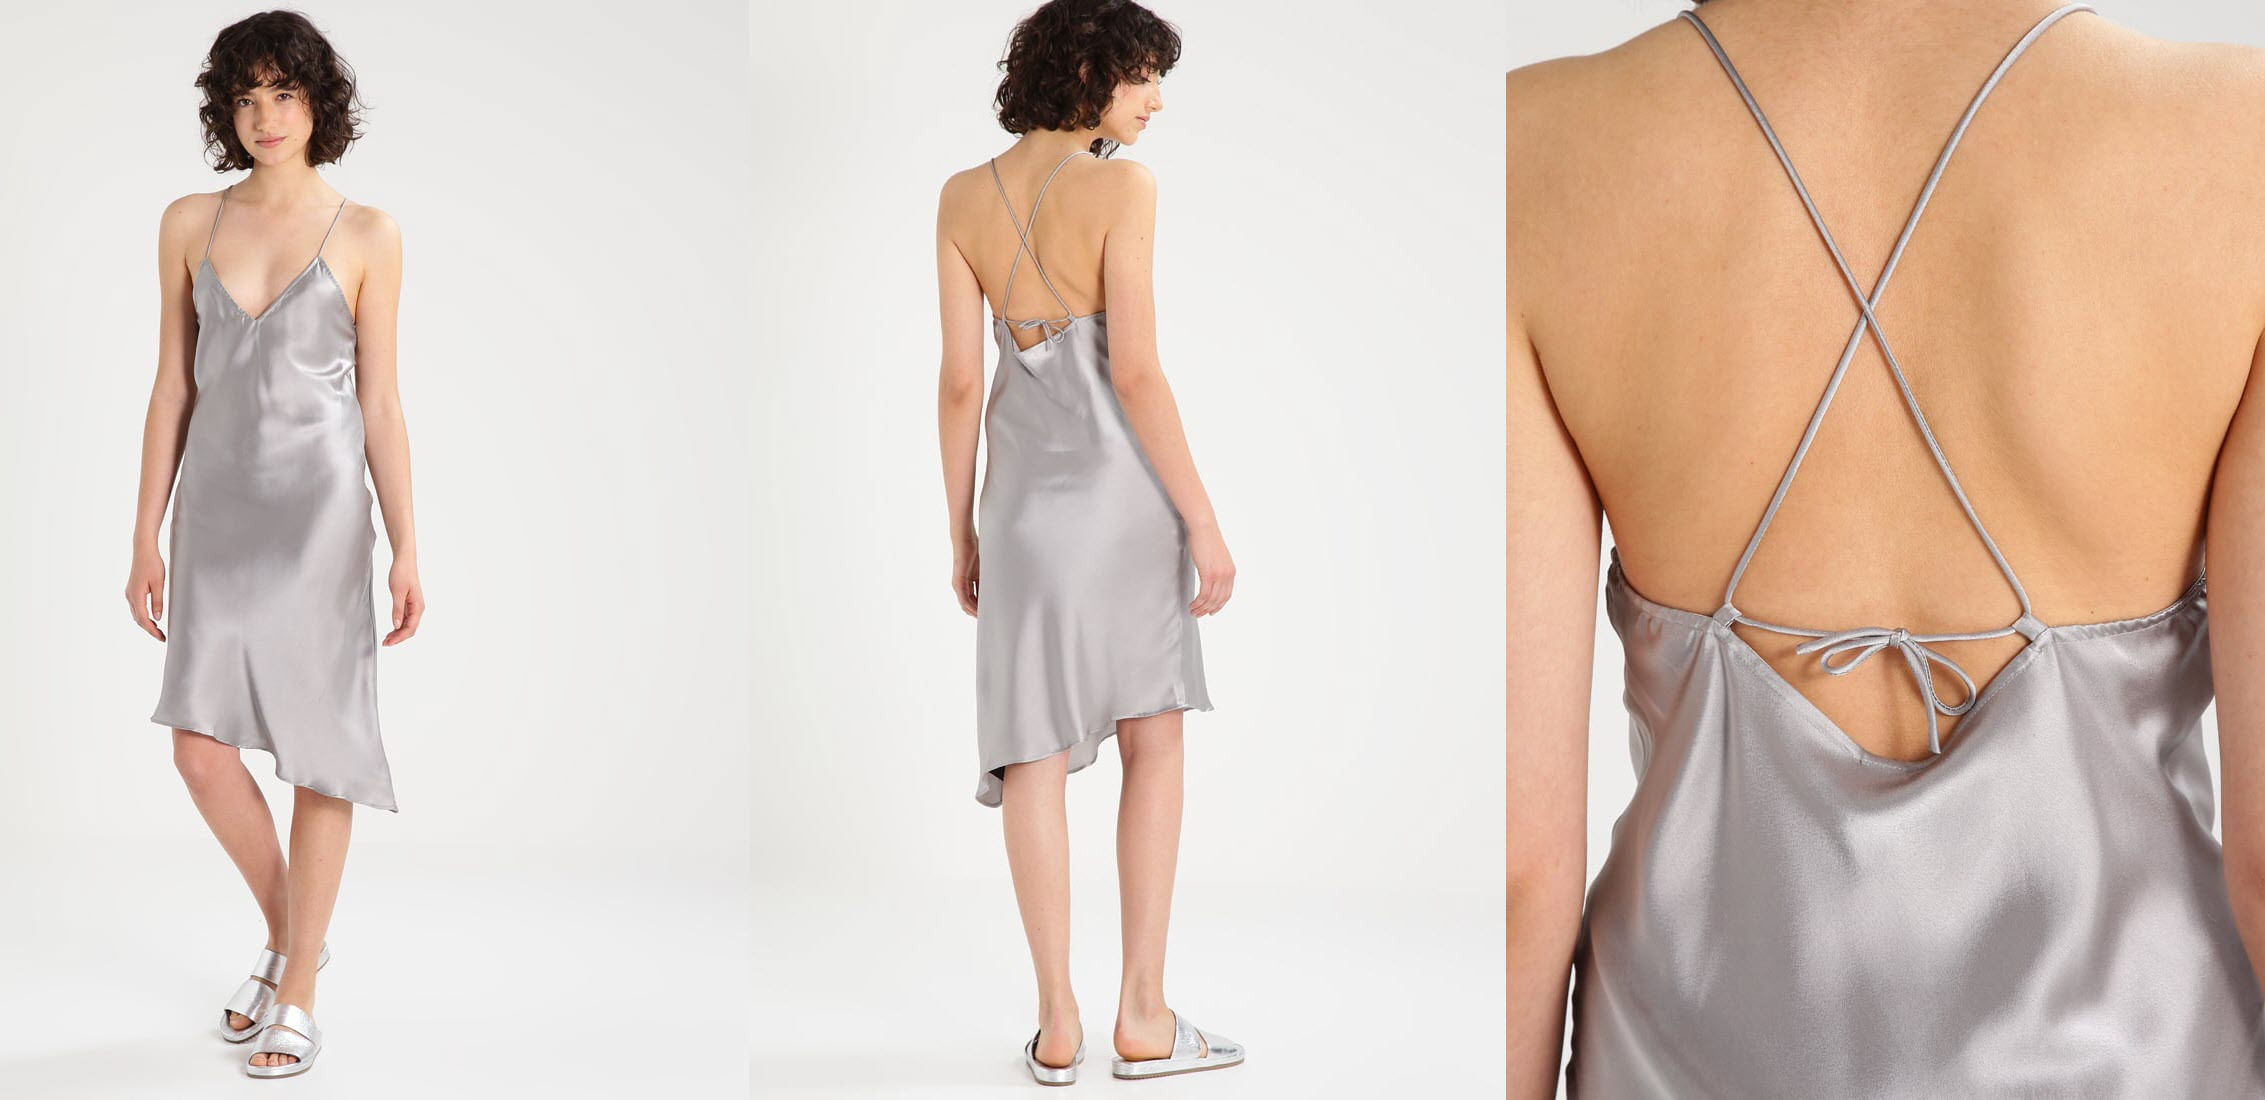 srebrna sukienka sylwestrowa